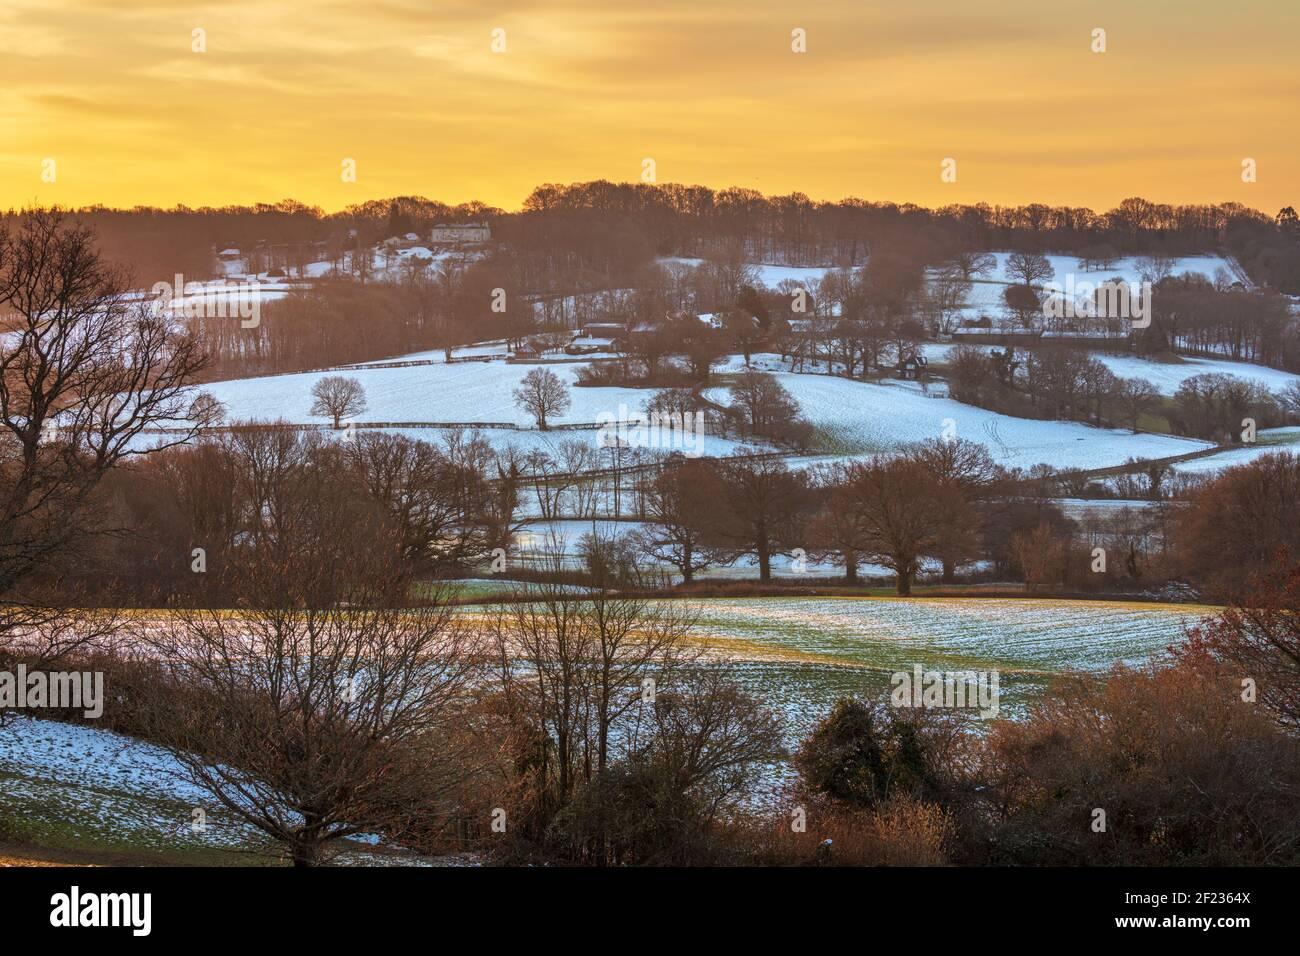 Winter sunrise over High Weald landscape, Burwash, East Sussex, England, United Kingdom, Europe Stock Photo